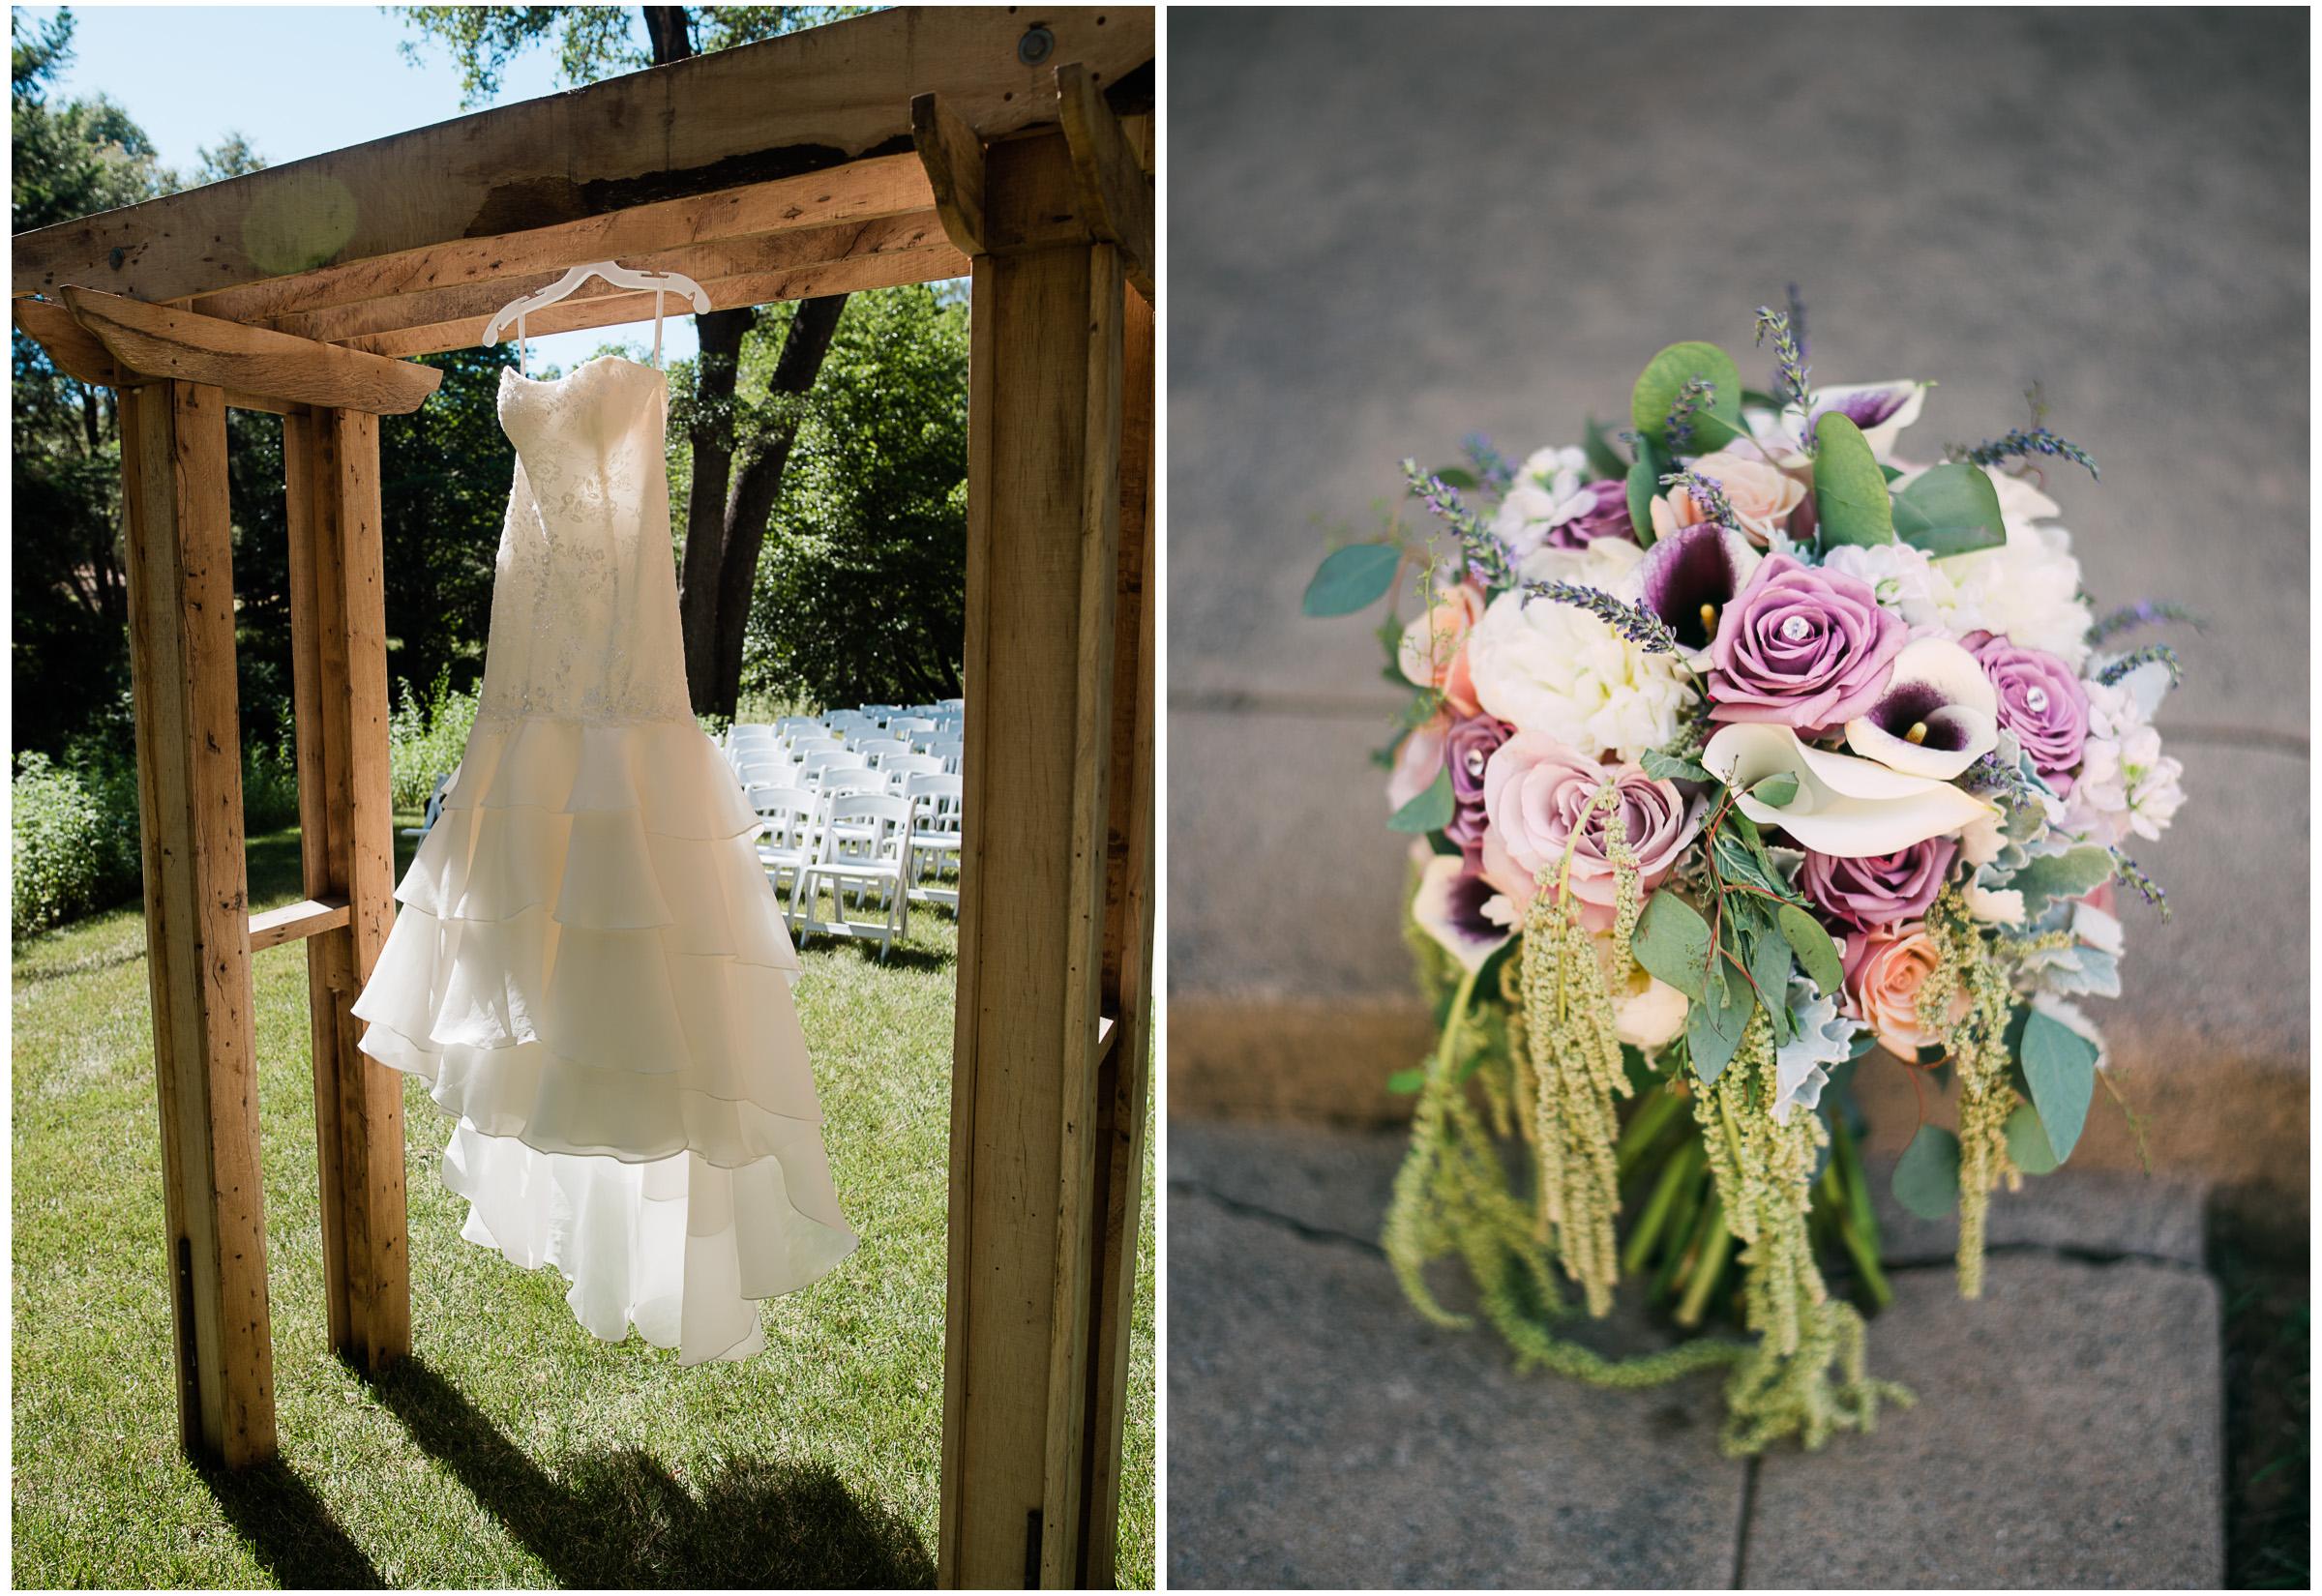 Placerville Wedding - Sacramento Photographer - Justin Wilcox Photography - 4.jpg